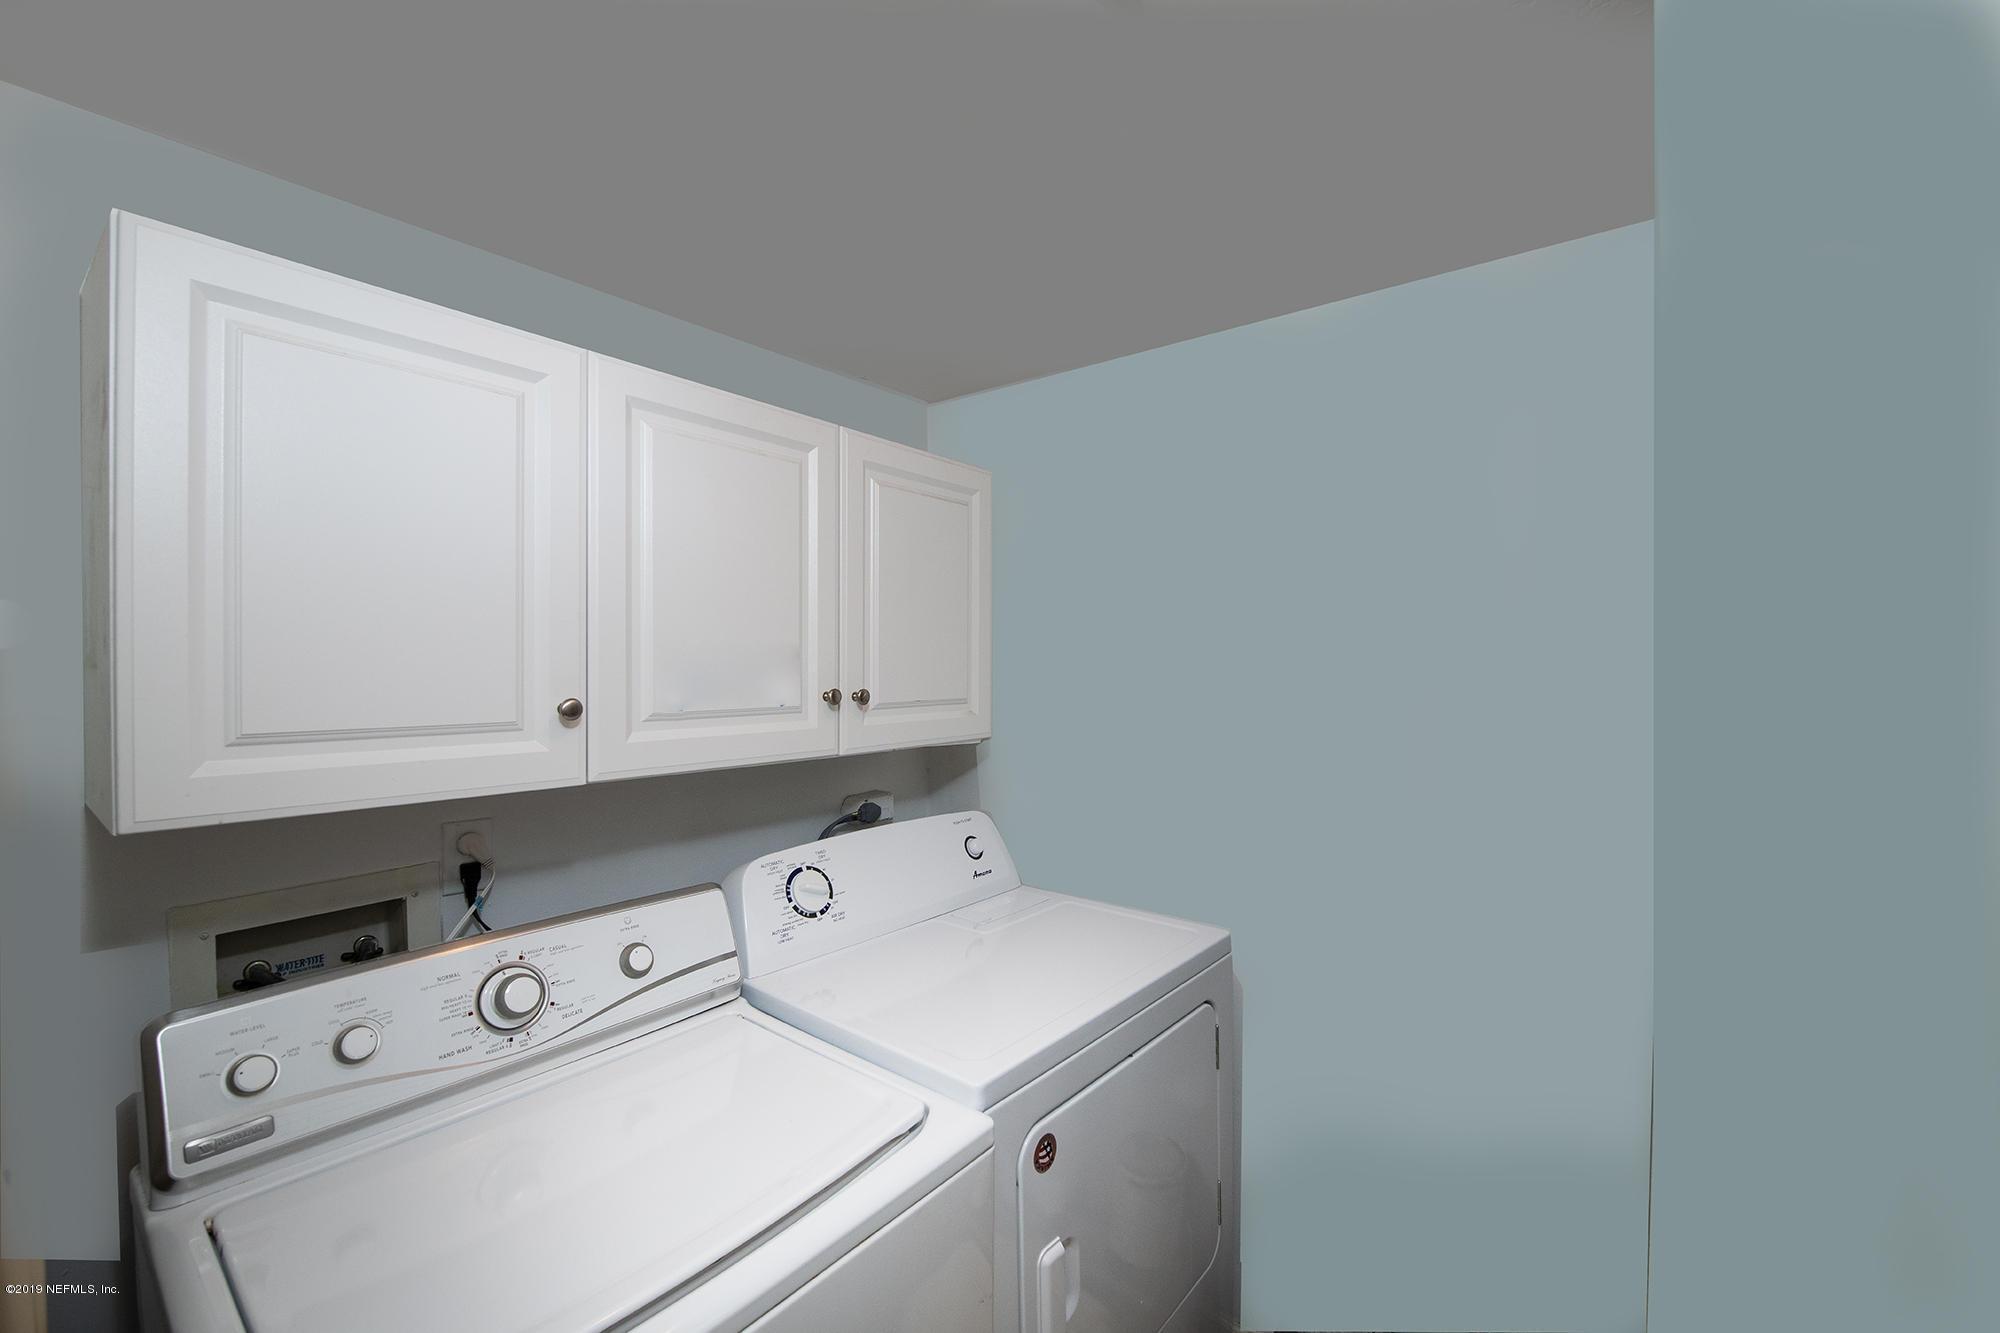 645 PONTE VEDRA, PONTE VEDRA BEACH, FLORIDA 32082, 3 Bedrooms Bedrooms, ,3 BathroomsBathrooms,Condo,For sale,PONTE VEDRA,1012102